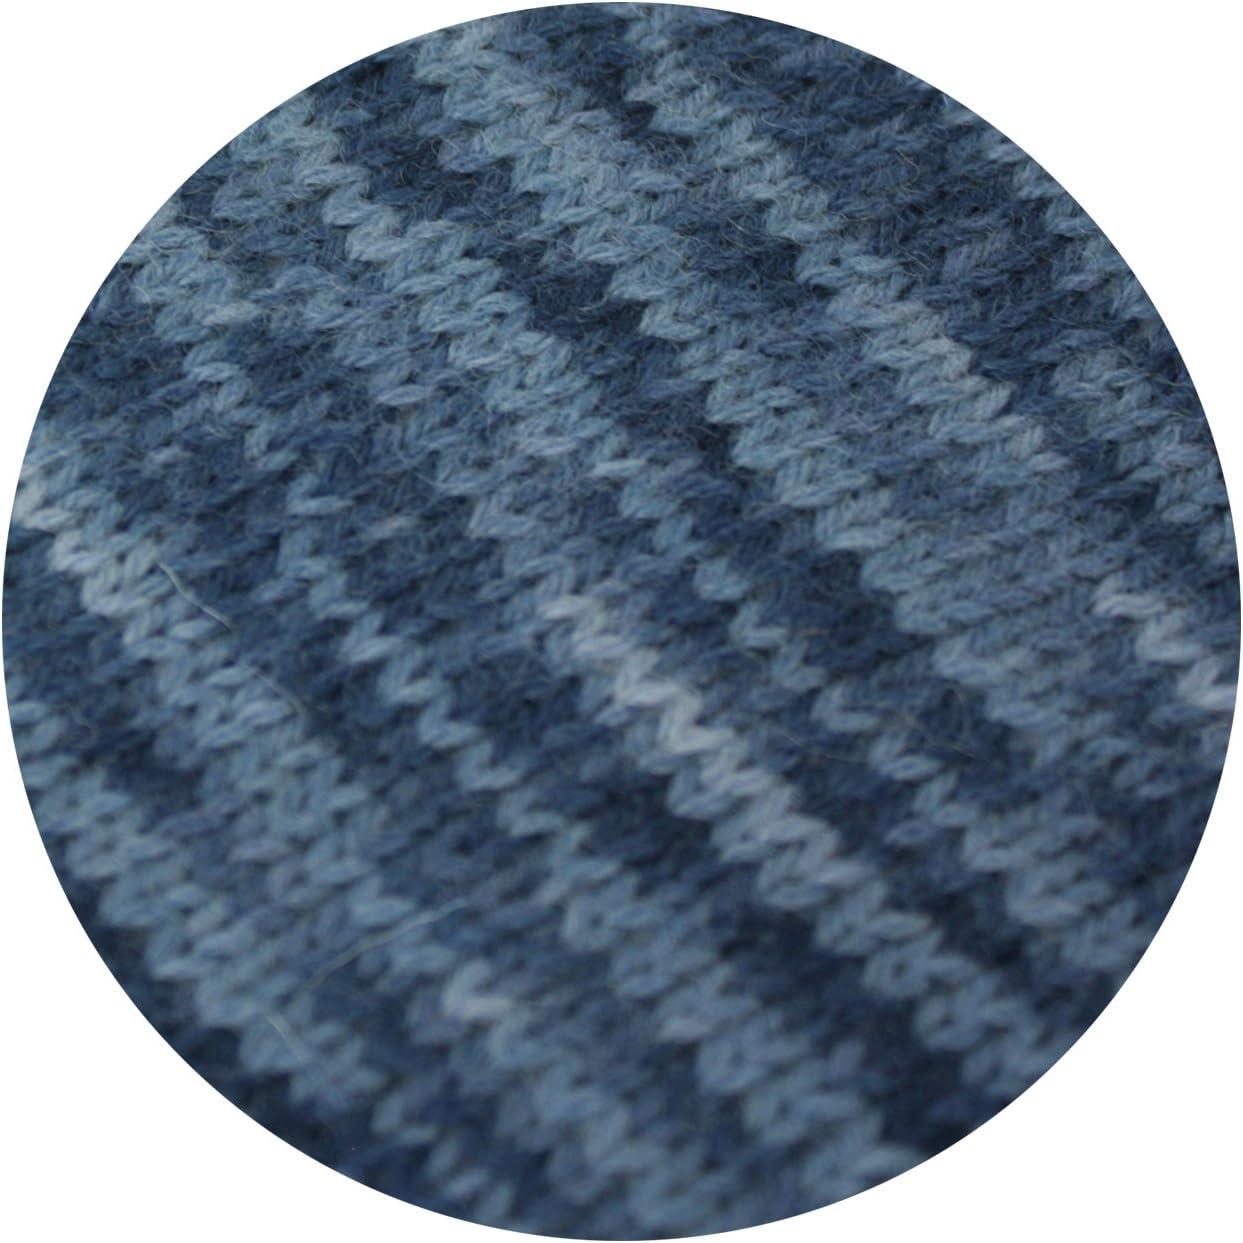 Sockenstrick Set MyOma Sockengarn Stricken -Oma Christines Herrenstr/ümpfe blau INKL Strickanleitung zum Socken Stricken 1 Kn/äuel Sockengarn zweifarbig GRATIS Label Nadeln- Strickset